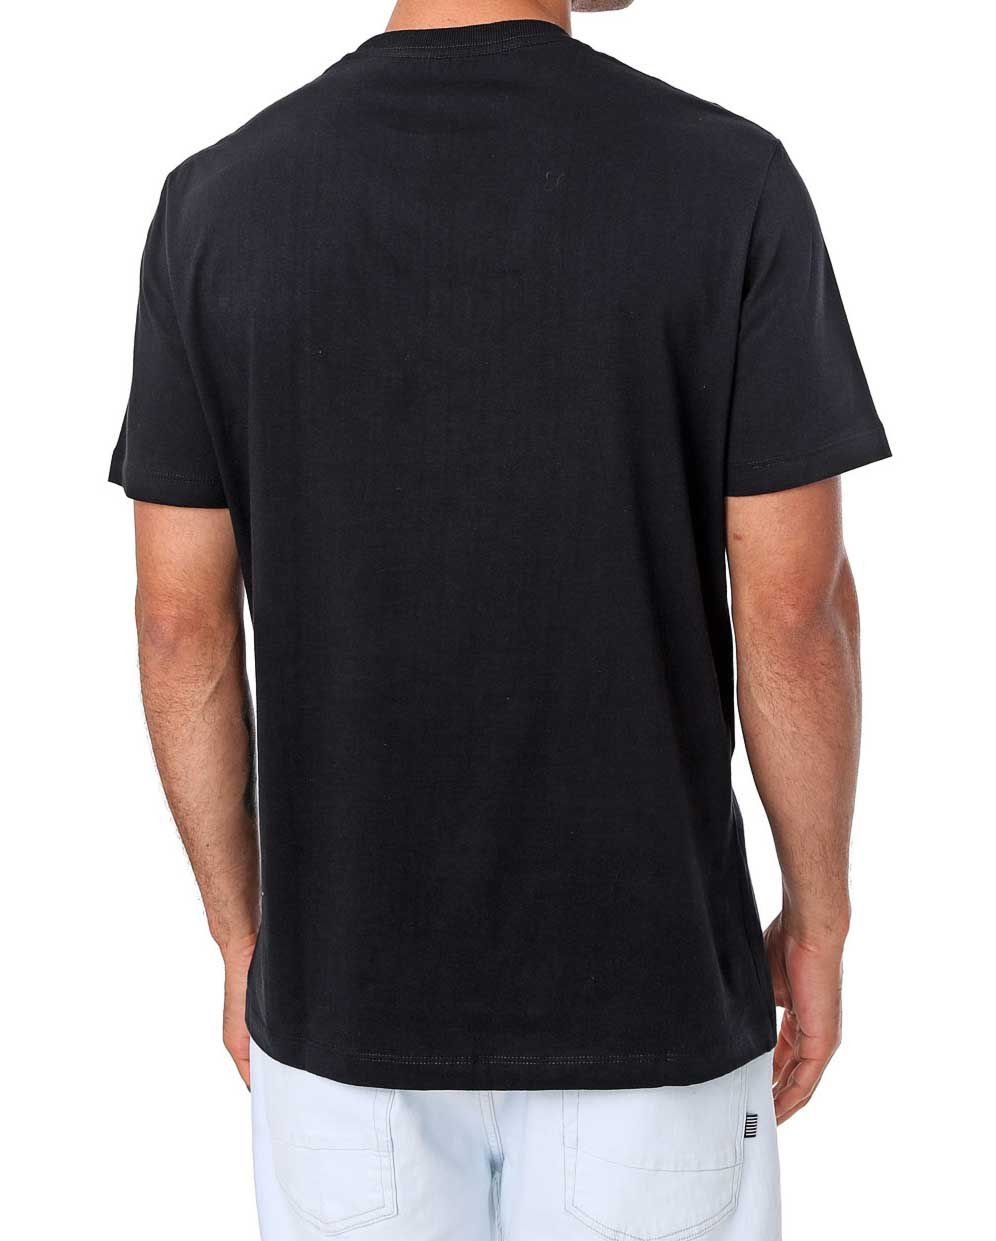 Camiseta Lost Dolar 22022824 Masculina